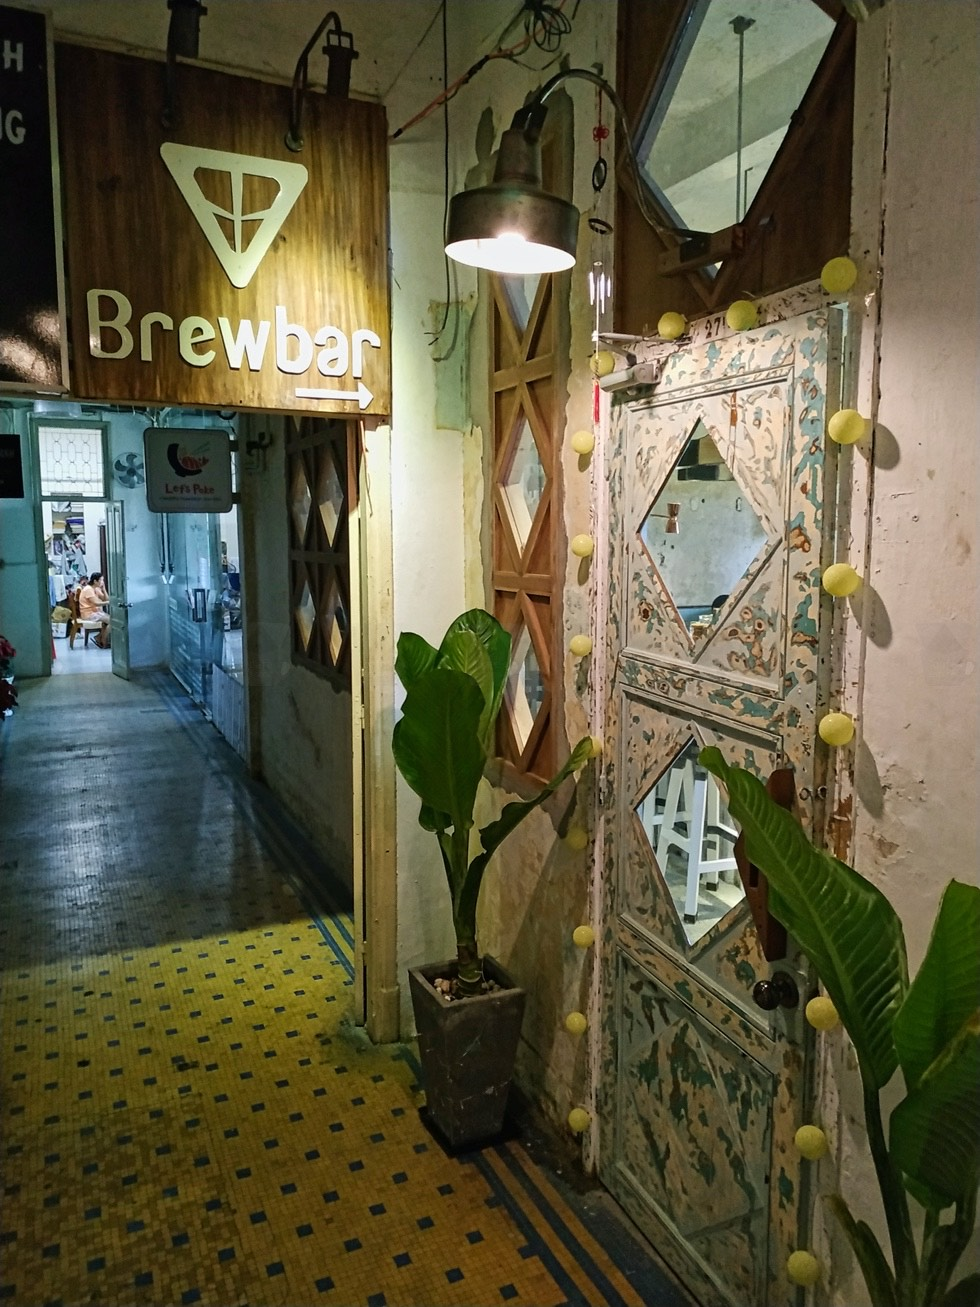 Brewbar Entrance